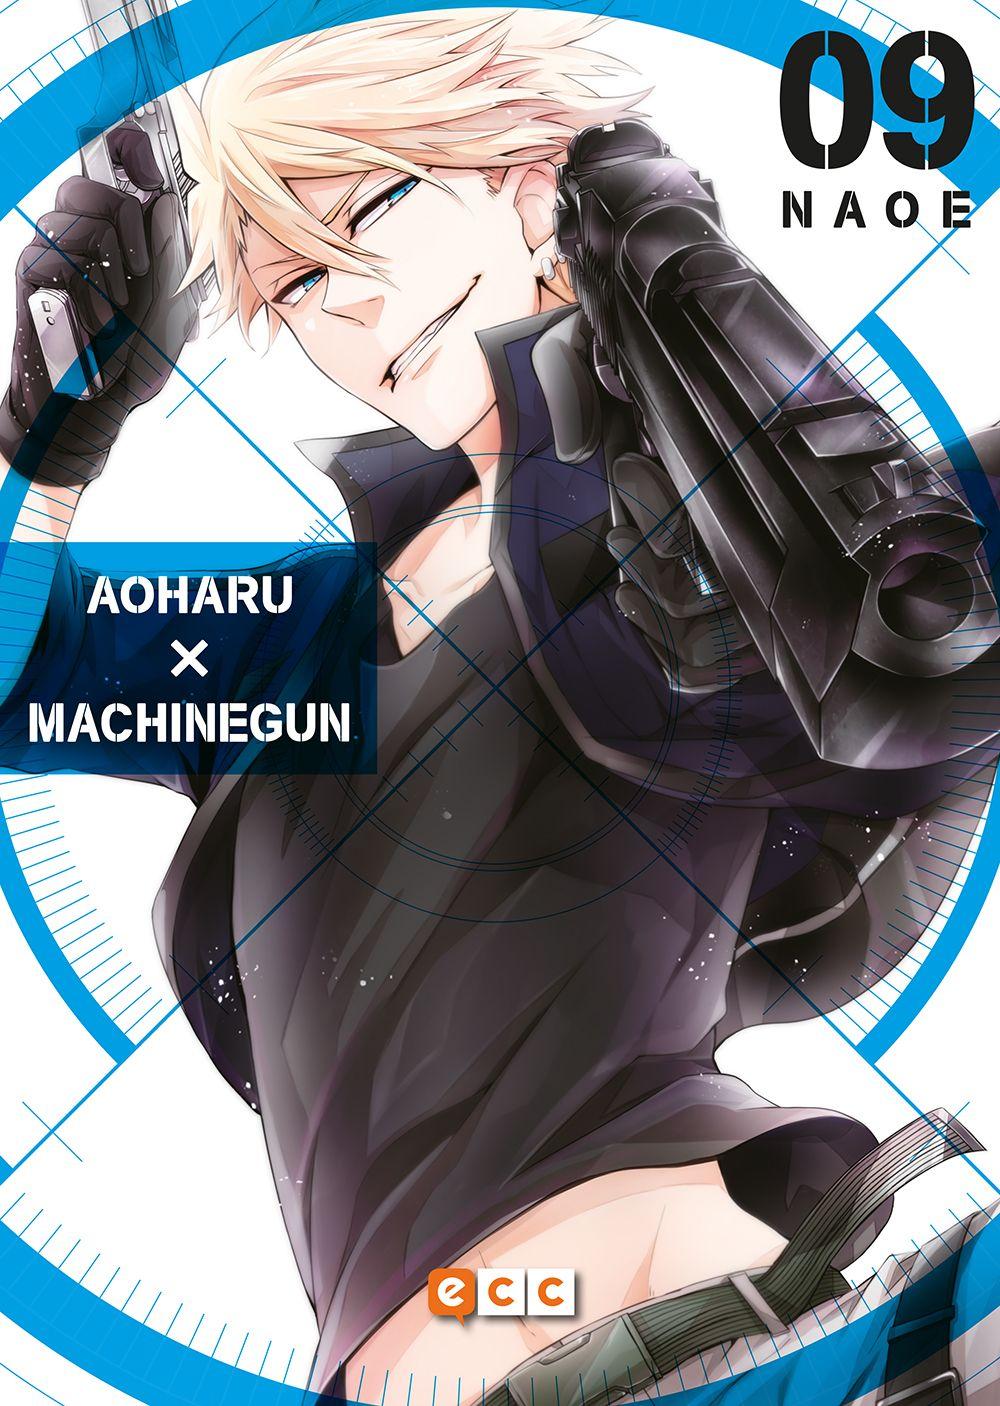 sobrecubierta_aoharu_x_machinegun_num9_web